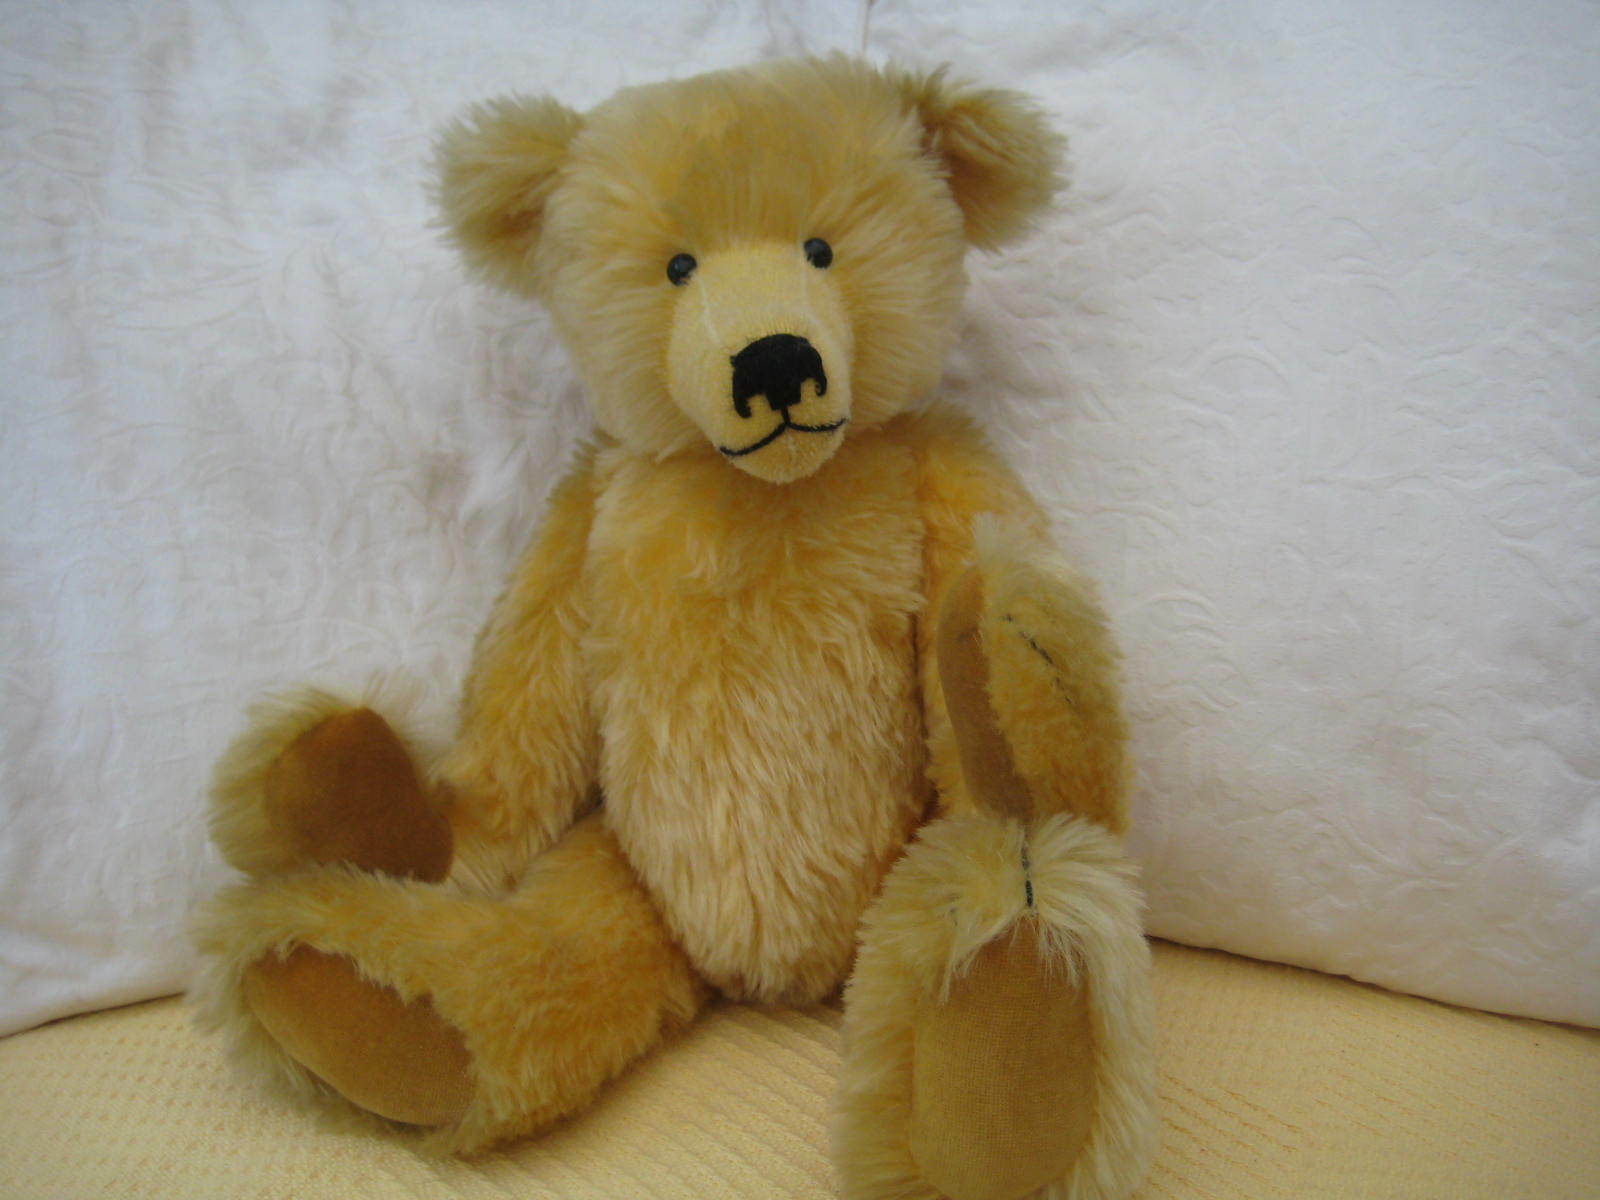 ASQUITHSBEAUTIFUL PRINCE RUPERT PROTOTYPE BEAR IN LUXURIOUS MOHAIR